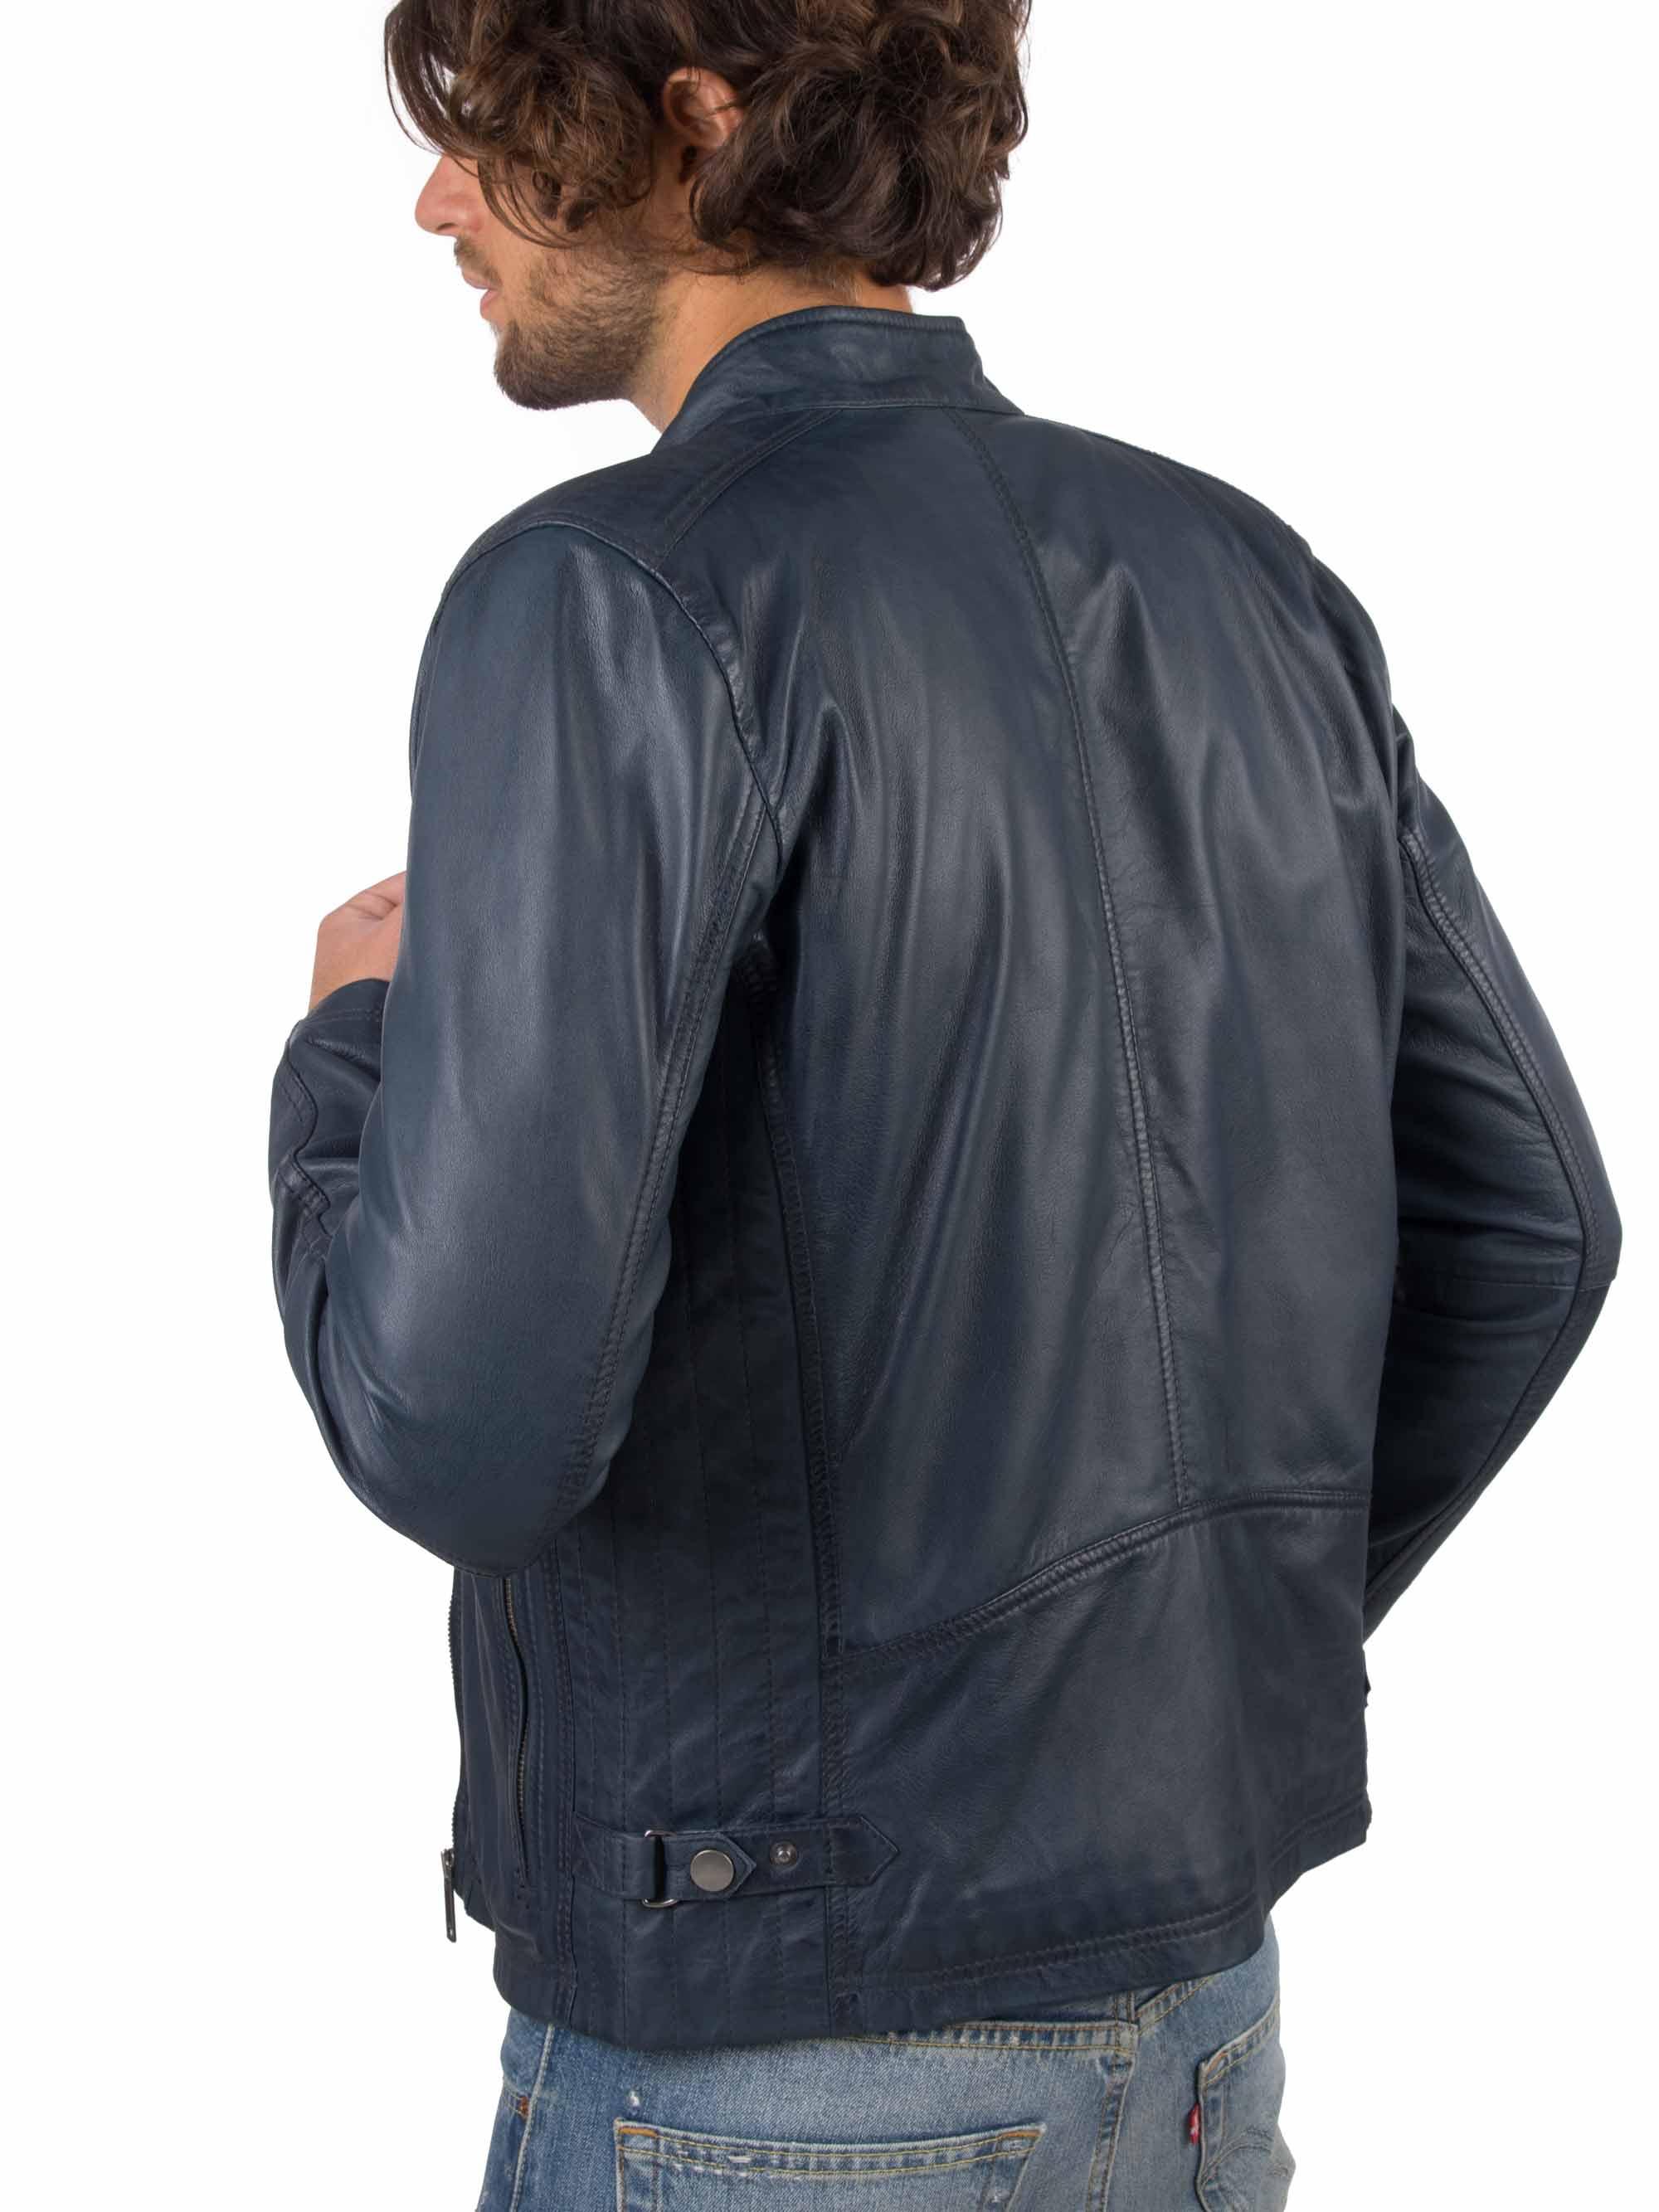 He9c14b18b3ef4c8d89c1c6a4a7bb9adbD VAINAS European Brand Mens Genuine Leather jacket for men Winter Real sheep leather jacket Motorcycle jackets Biker jackets Alfa